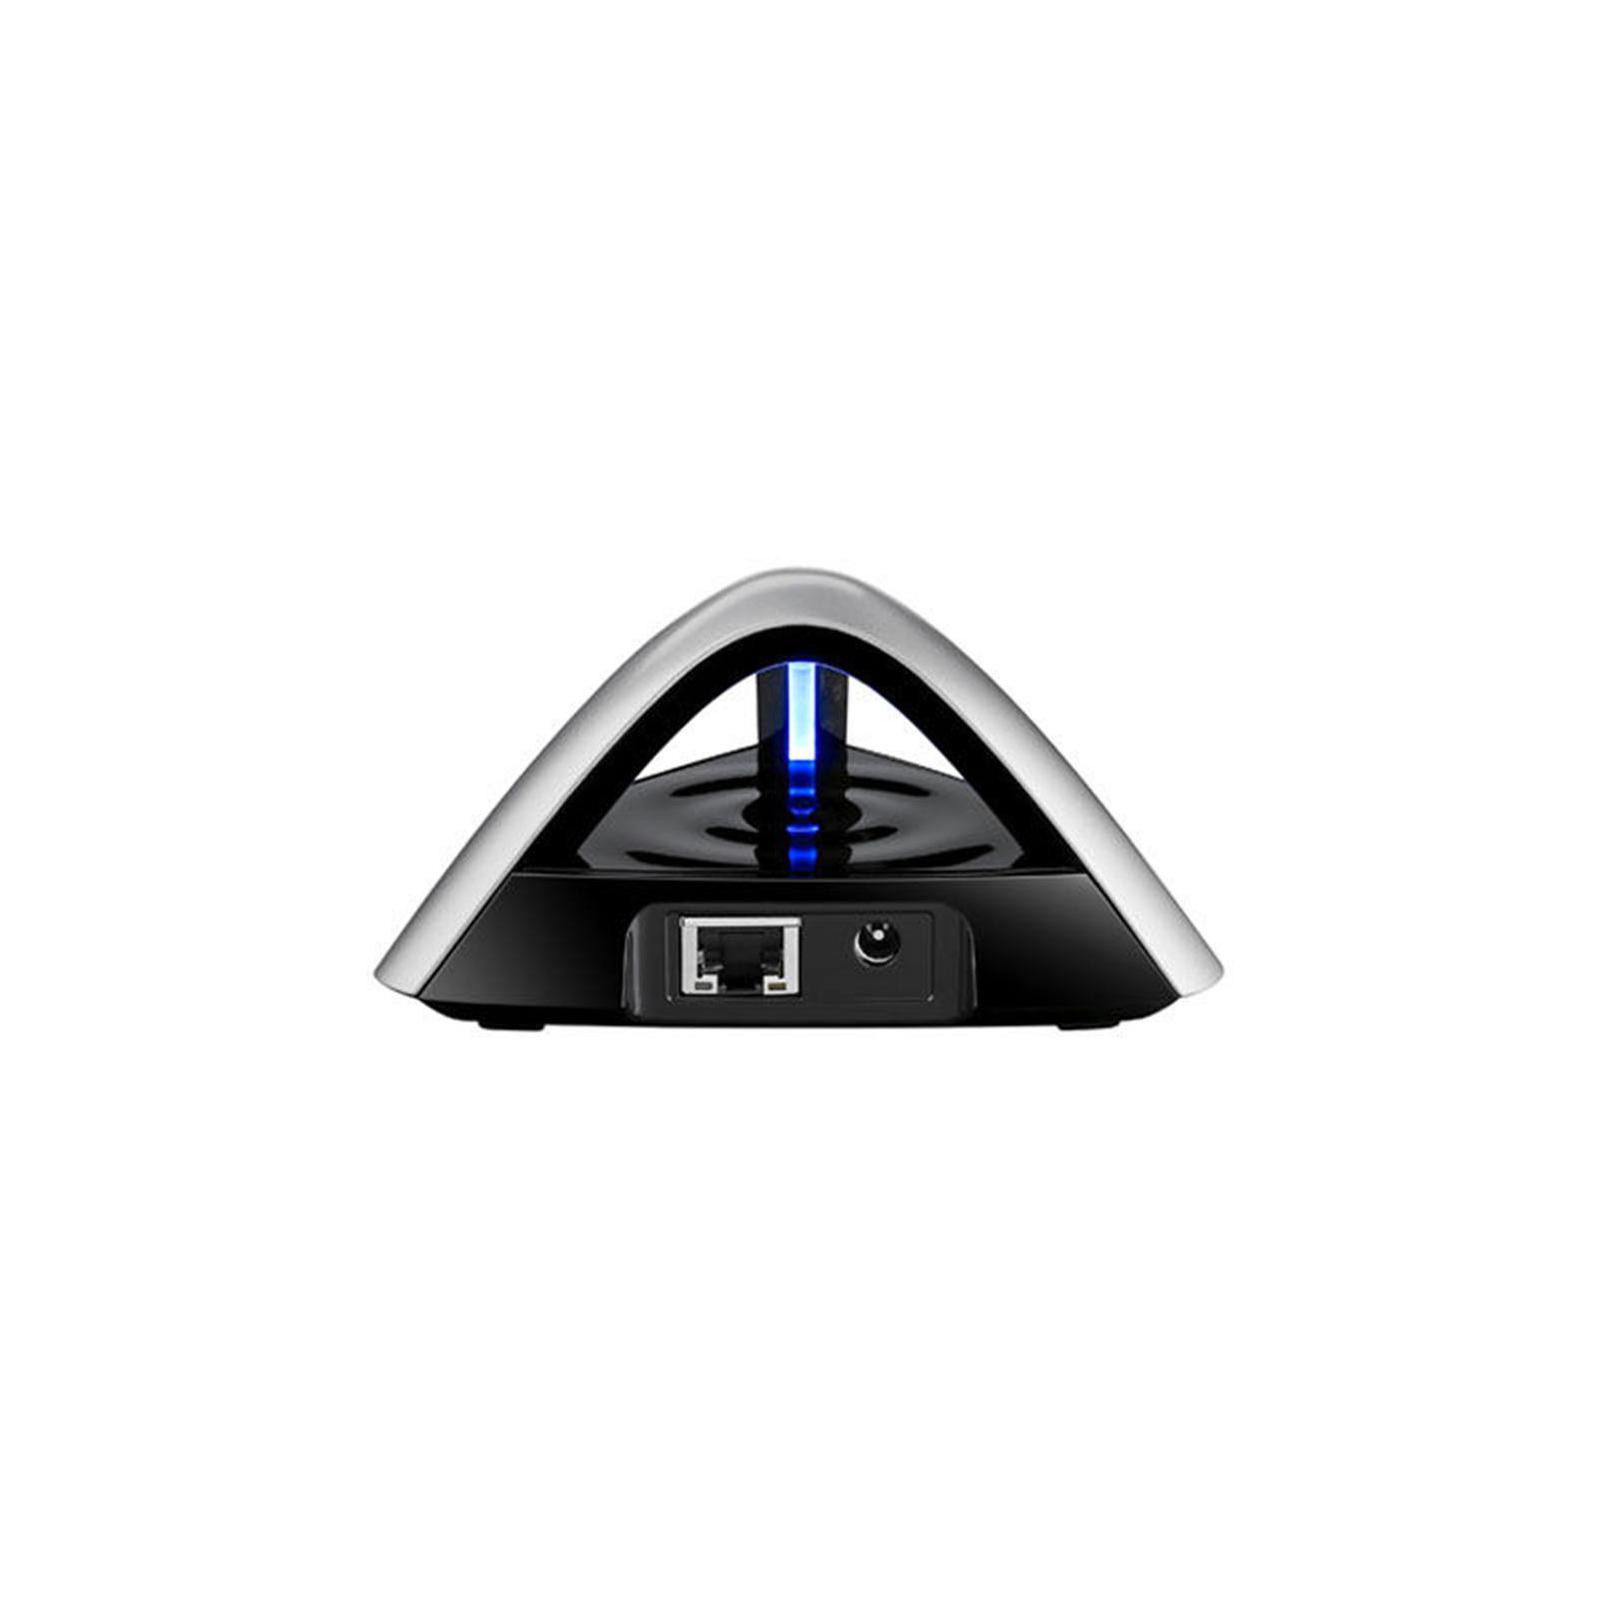 Сетевая карта Wi-Fi ASUS USB-N66 изображение 5